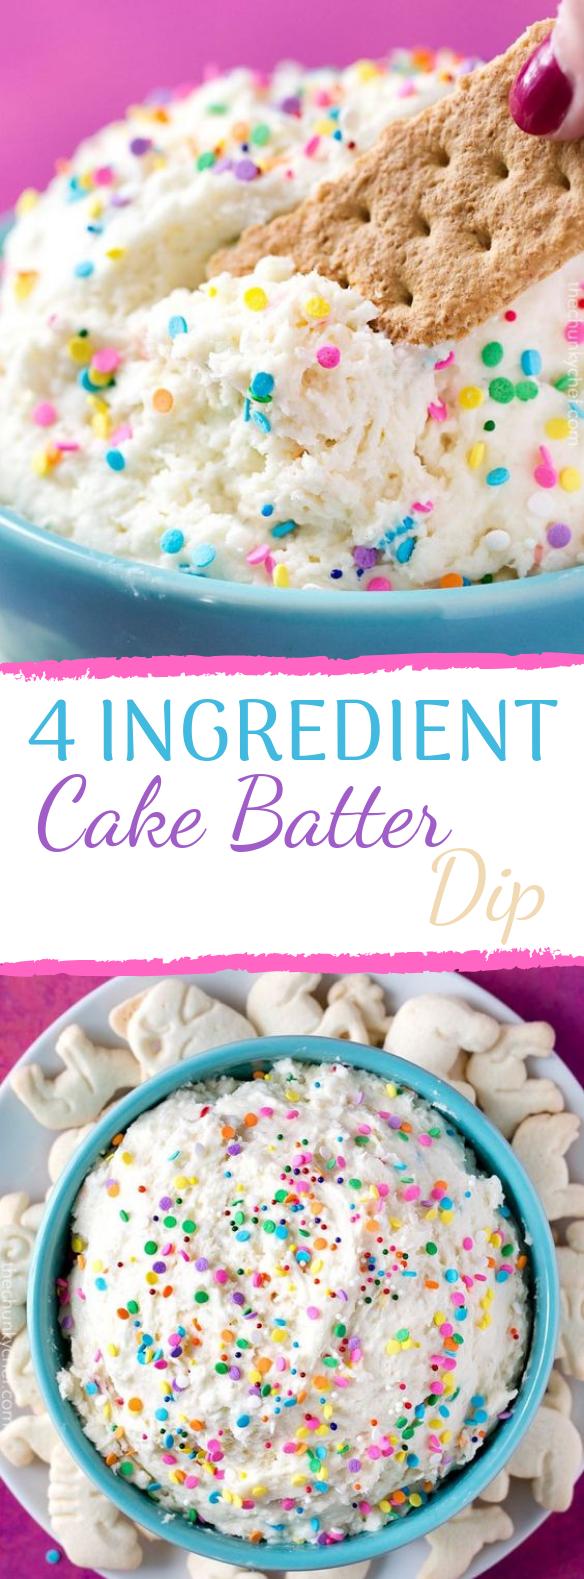 4 INGREDIENT FUNFETTI CAKE BATTER DIP #party #desserts